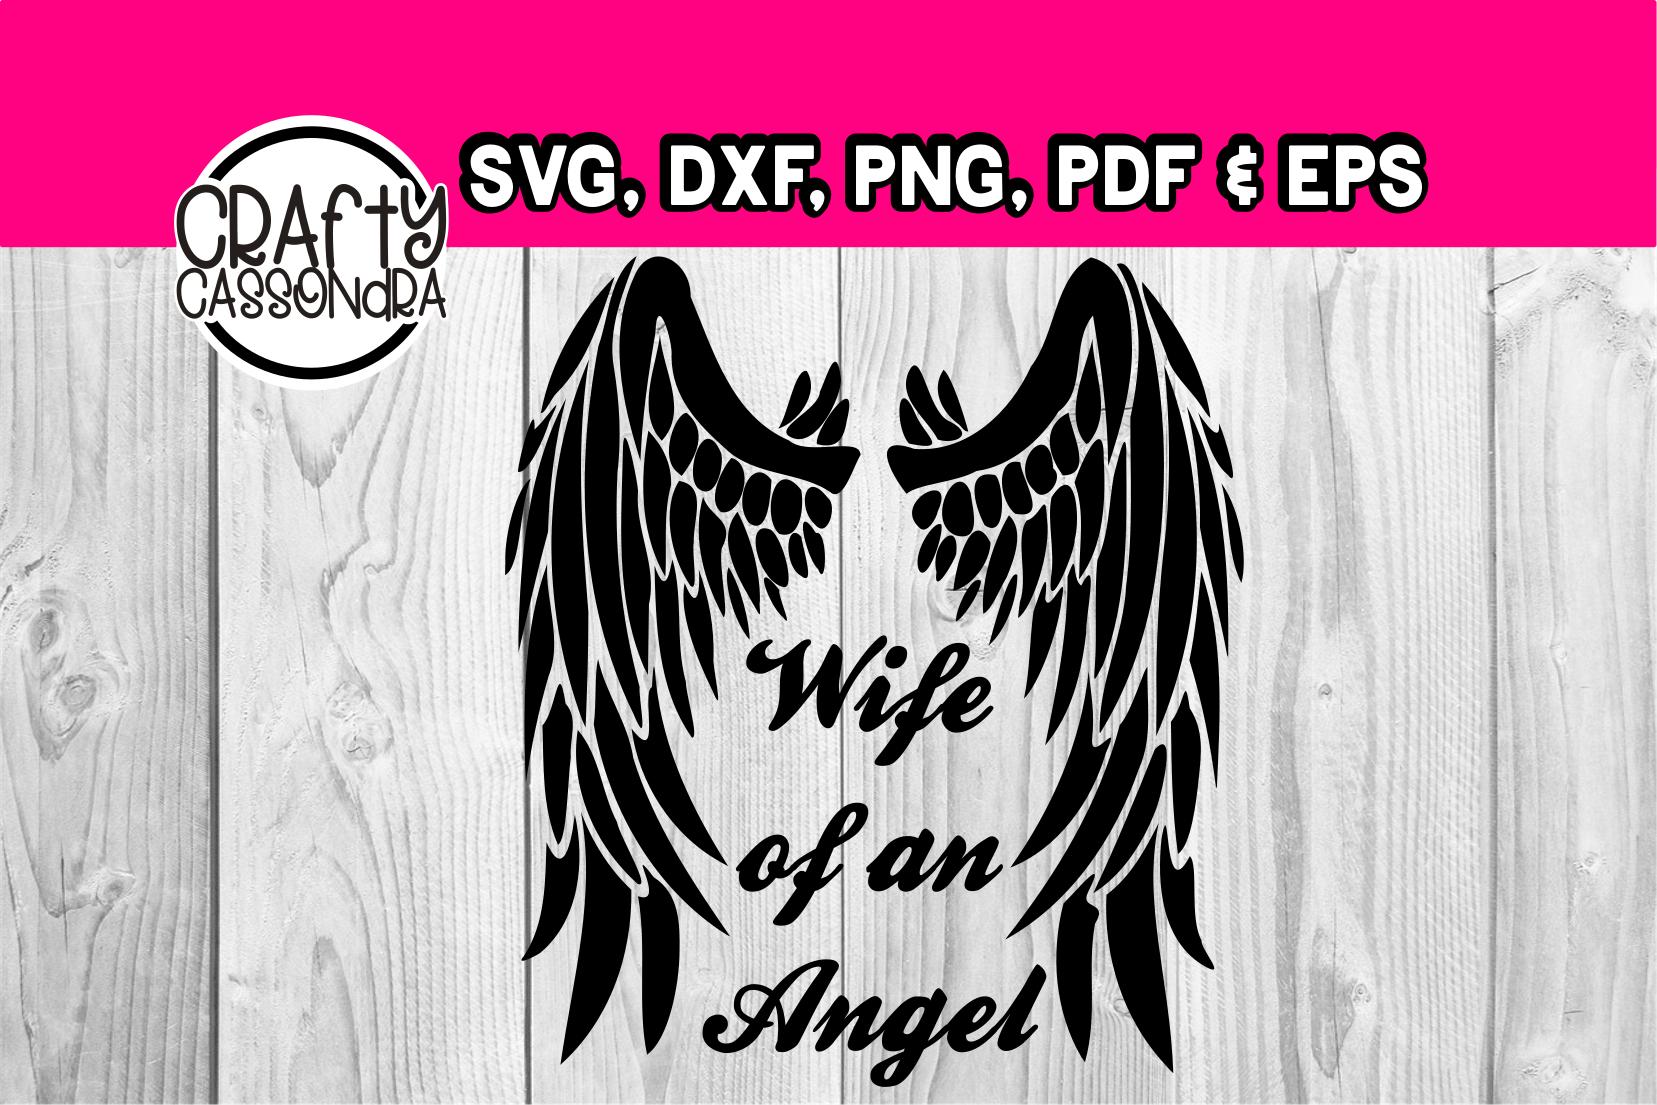 Memorial - Wife of an angel - Wings svg - Angel svg - diy example image 1